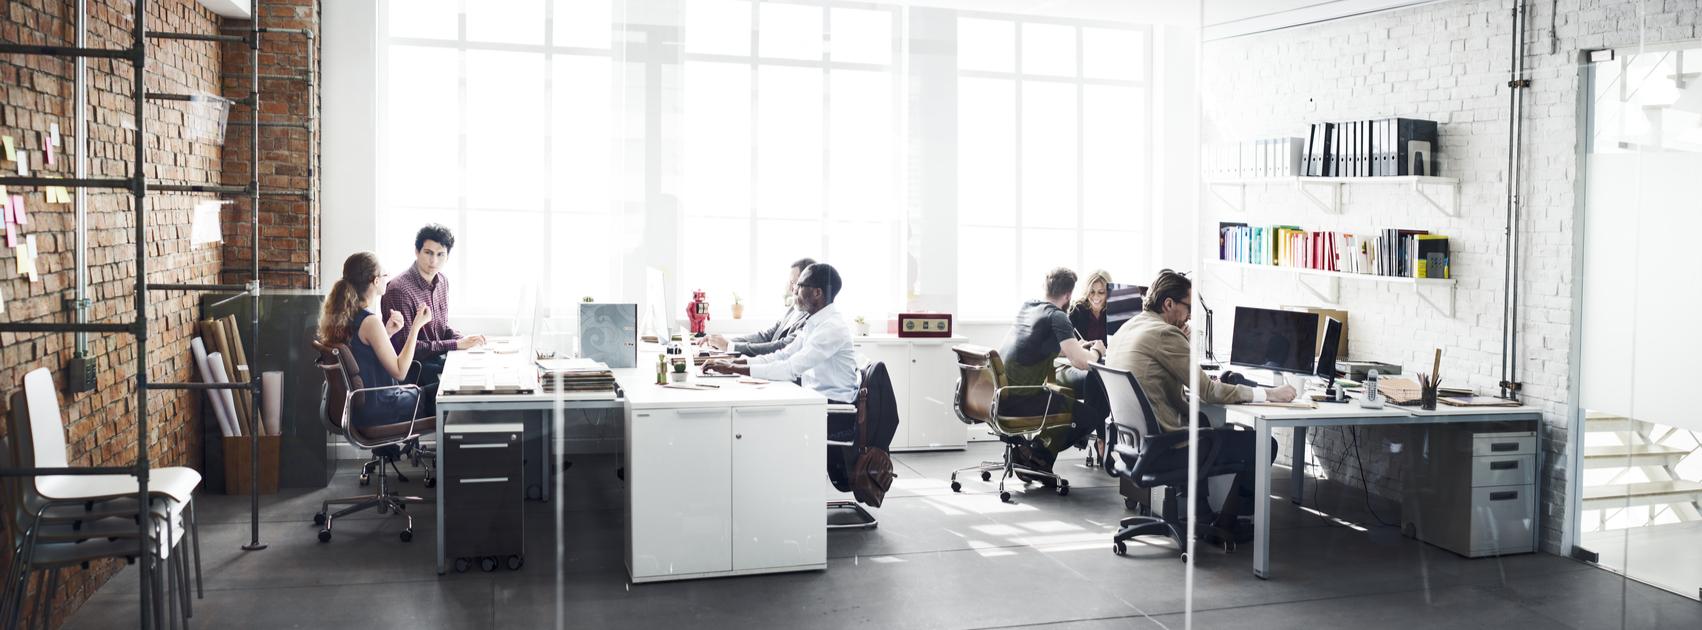 workplace-Jobfitts